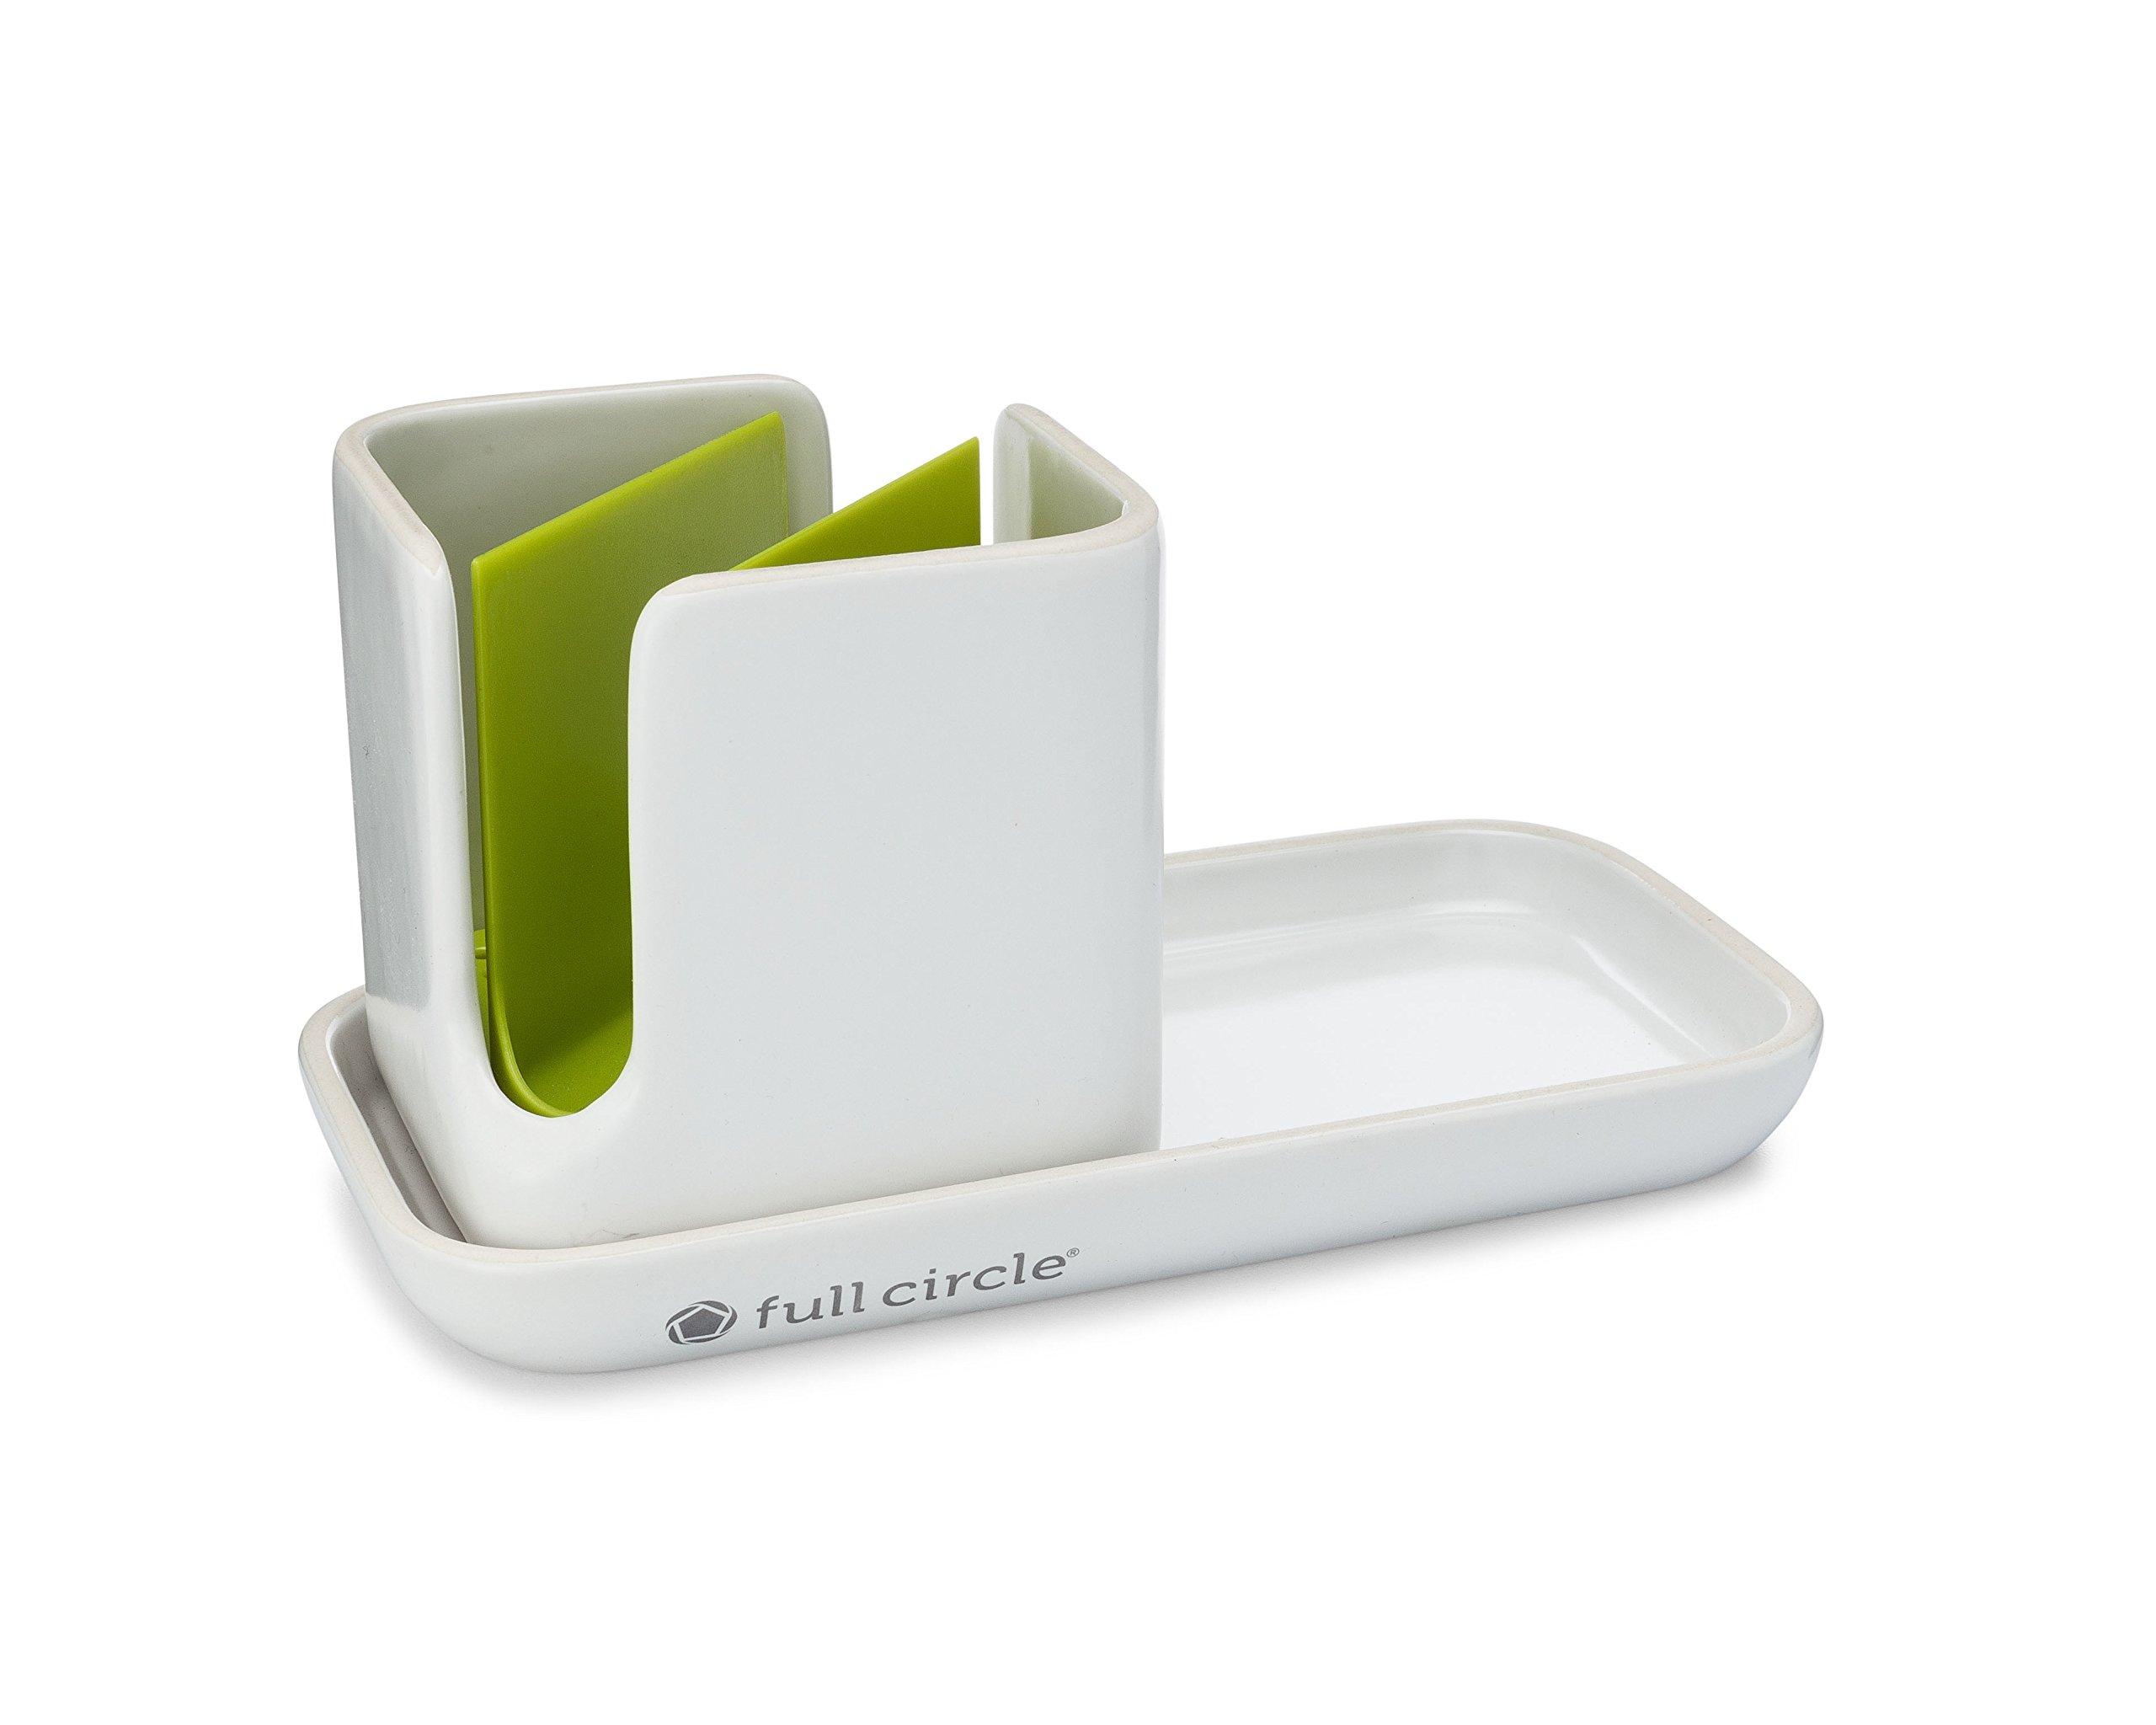 Full Circle Stash, Ceramic Sink Caddy, Green and White